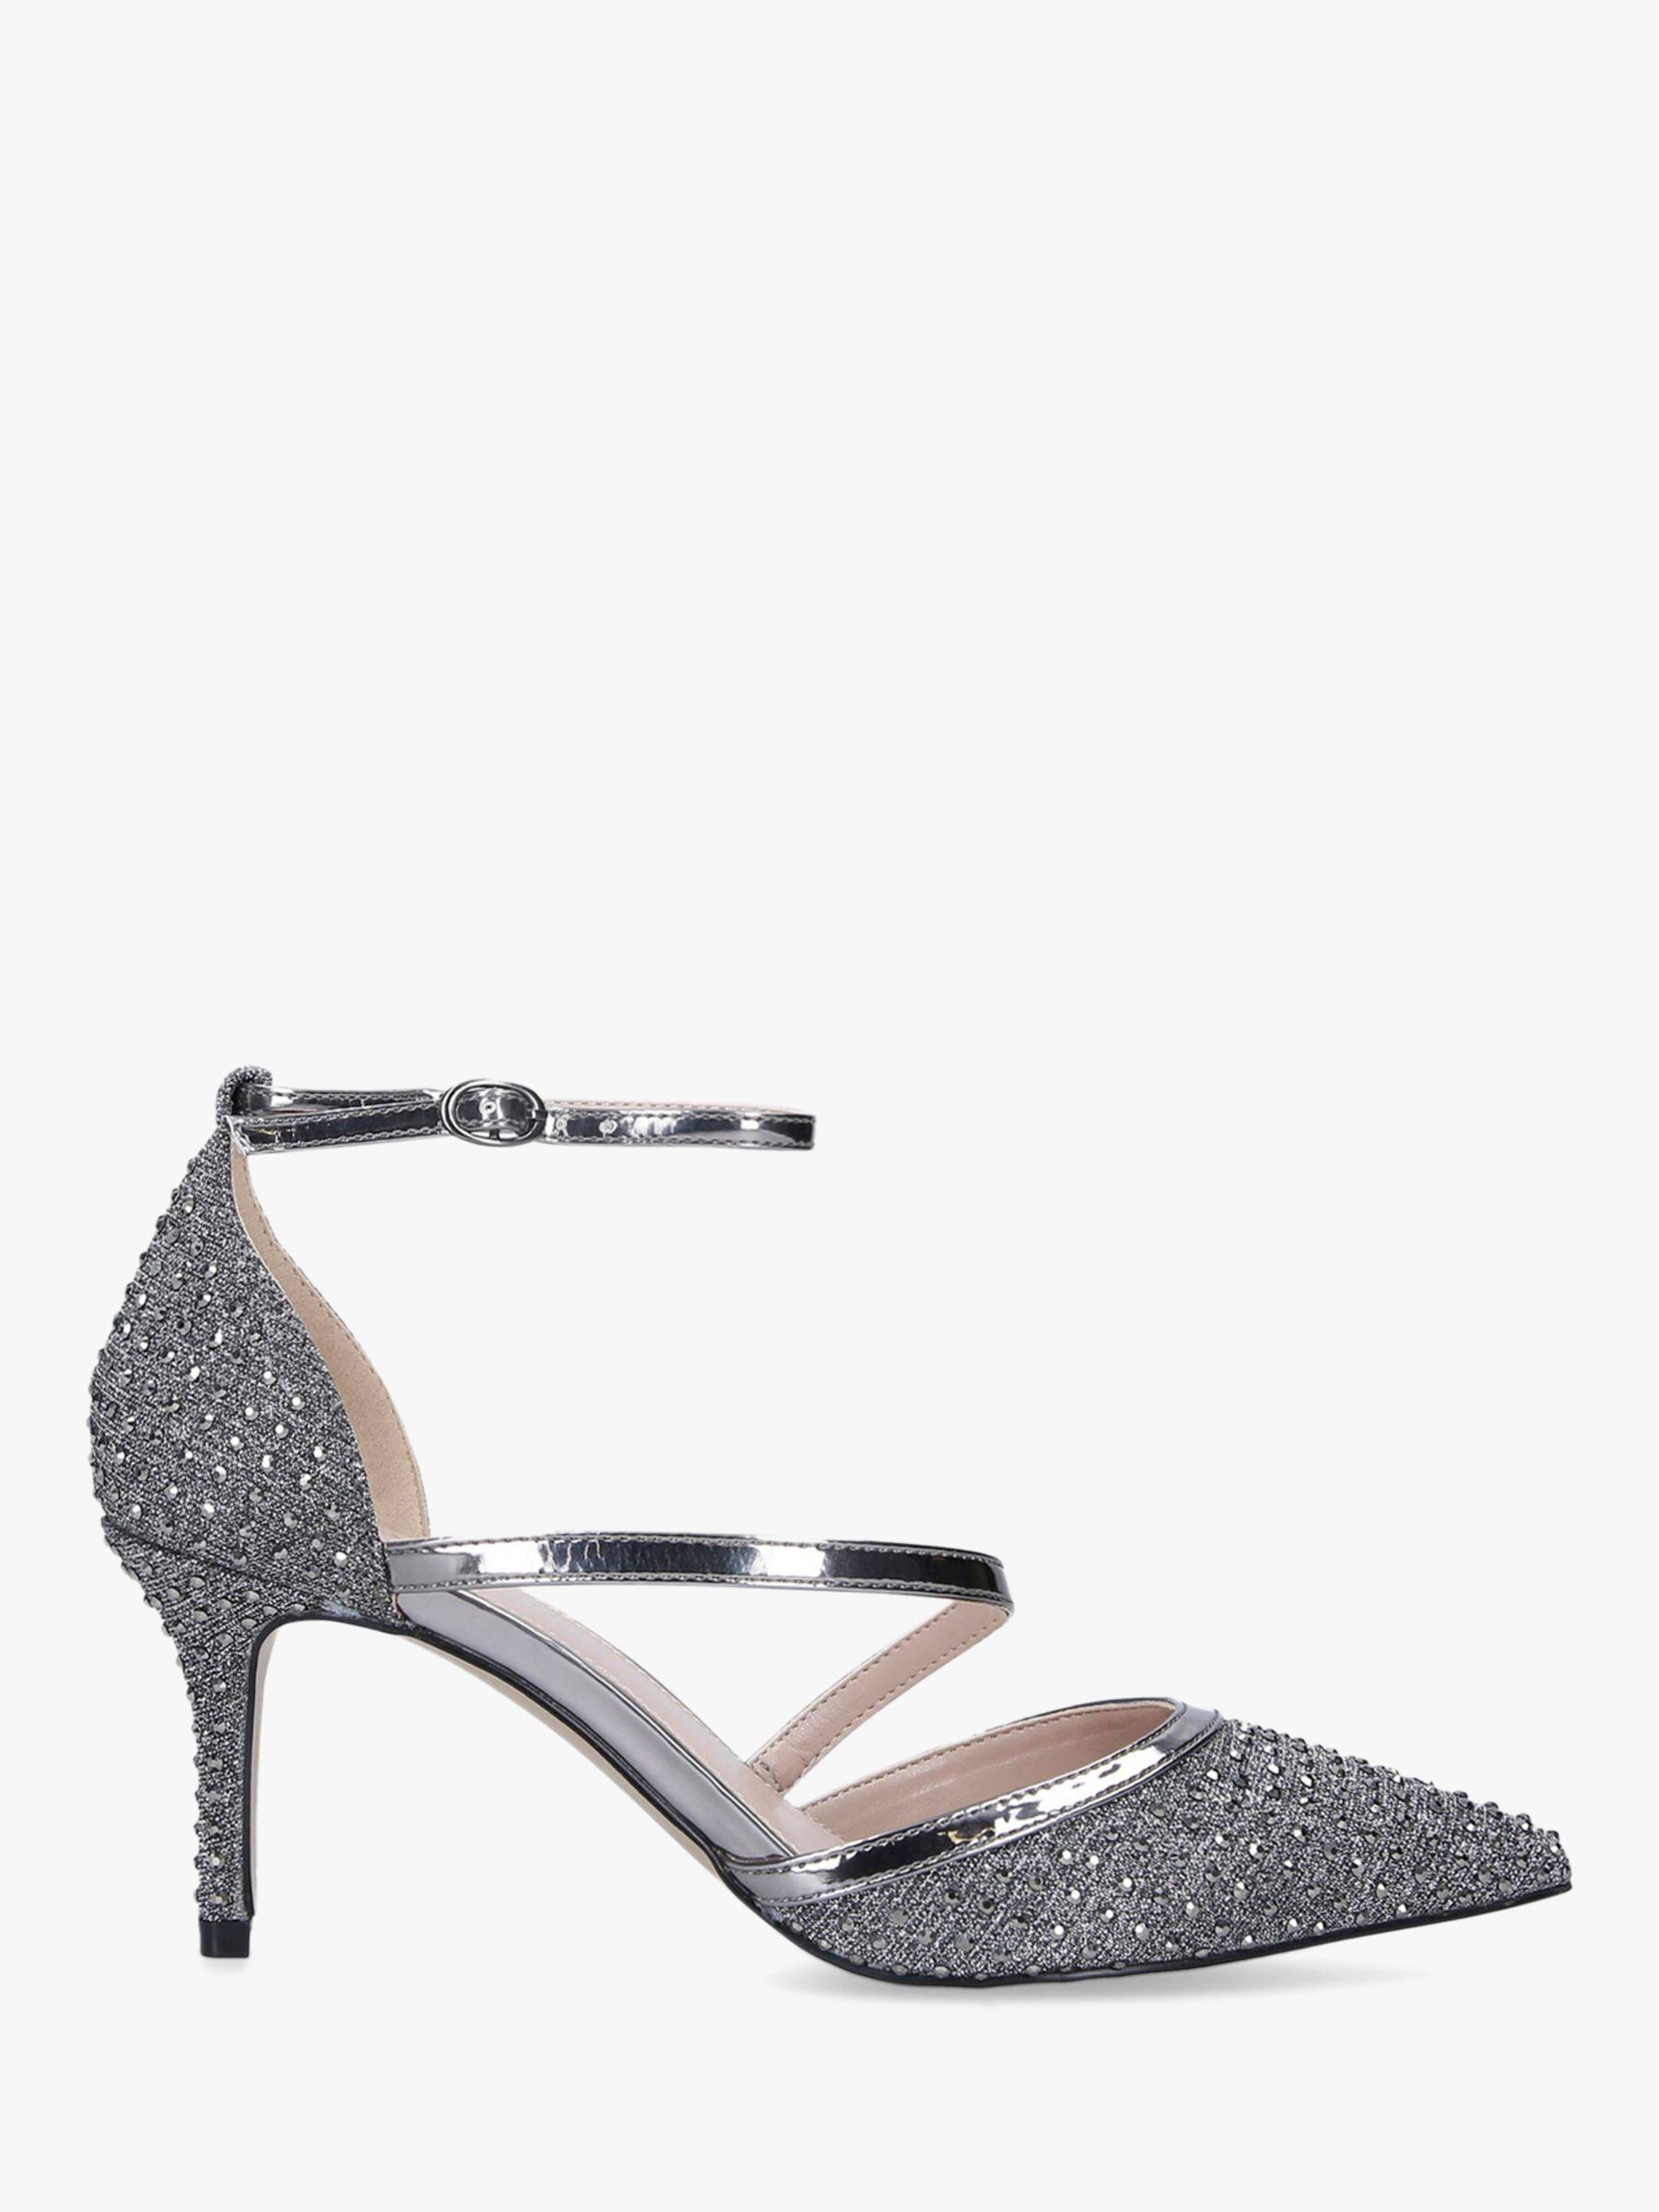 Carvela Carvela Kym Pointed Toe Cross Strap Heel Court Shoes, Grey Pewter